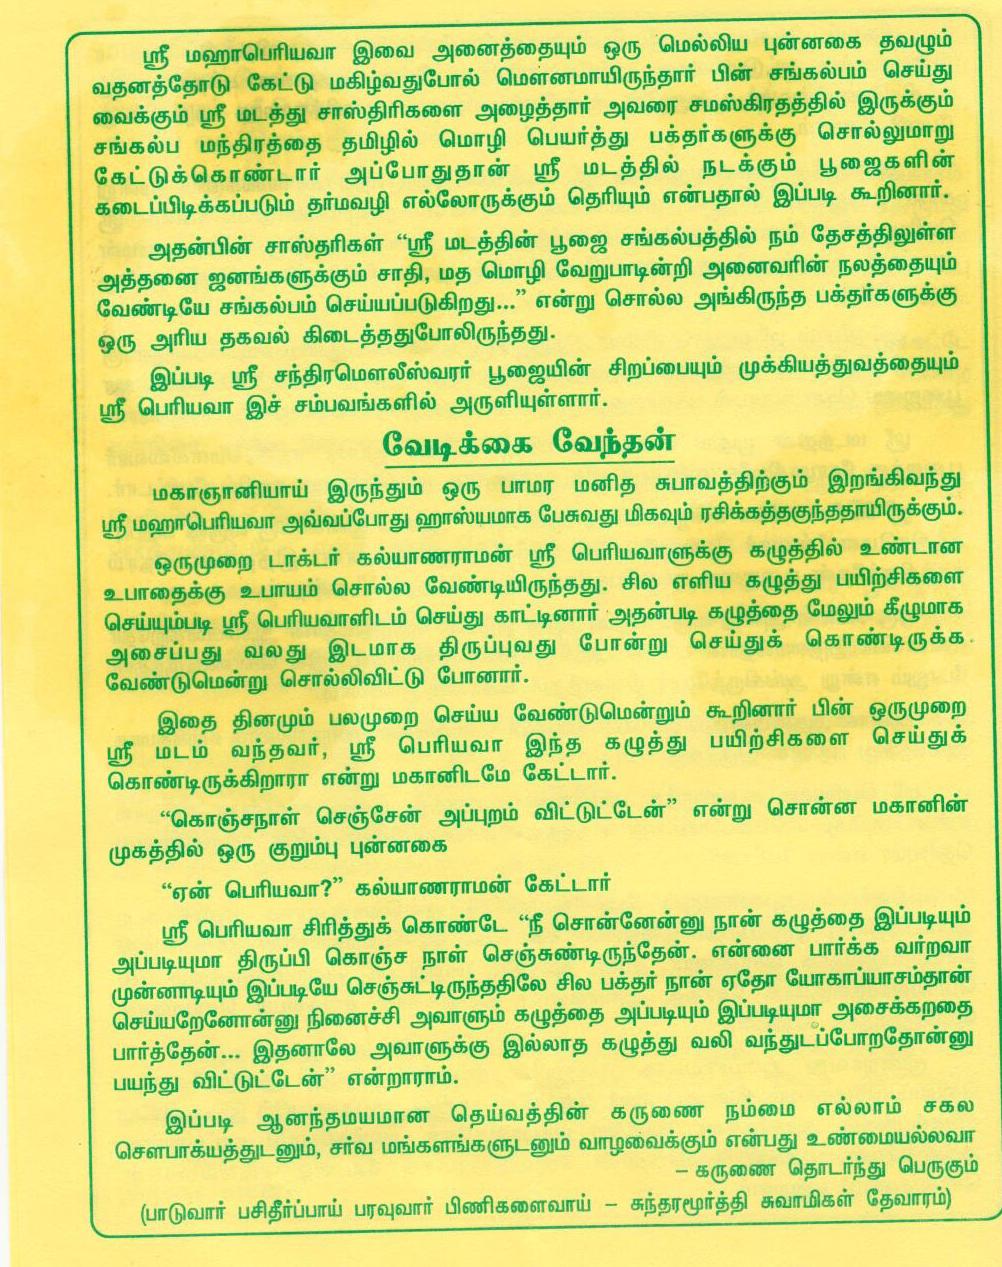 Why Periyavas do Chandramouleeswarar Puja? – Sage of Kanchi